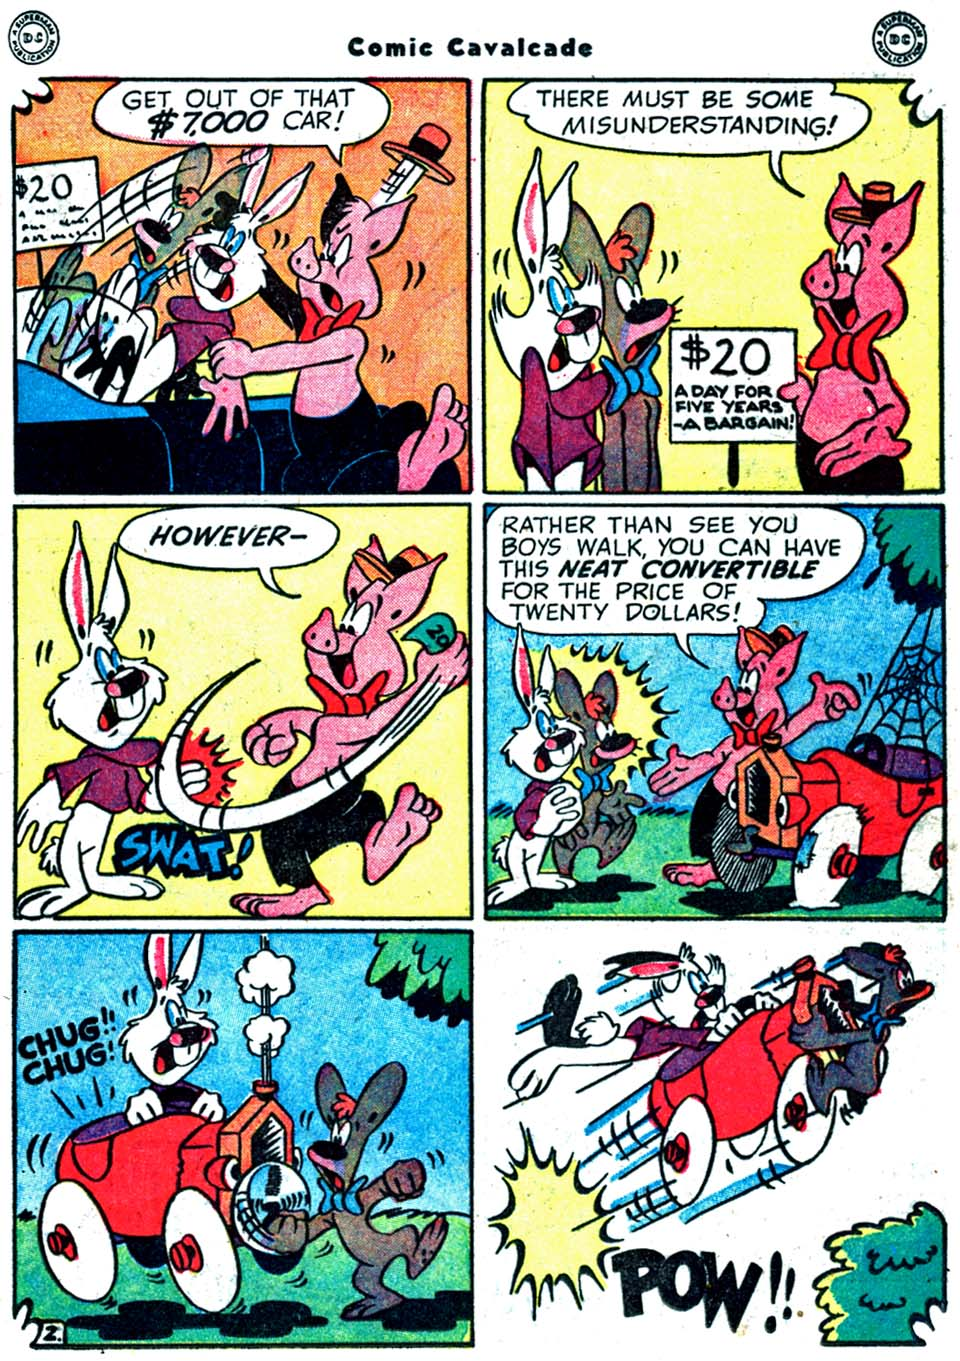 Comic Cavalcade issue 32 - Page 31